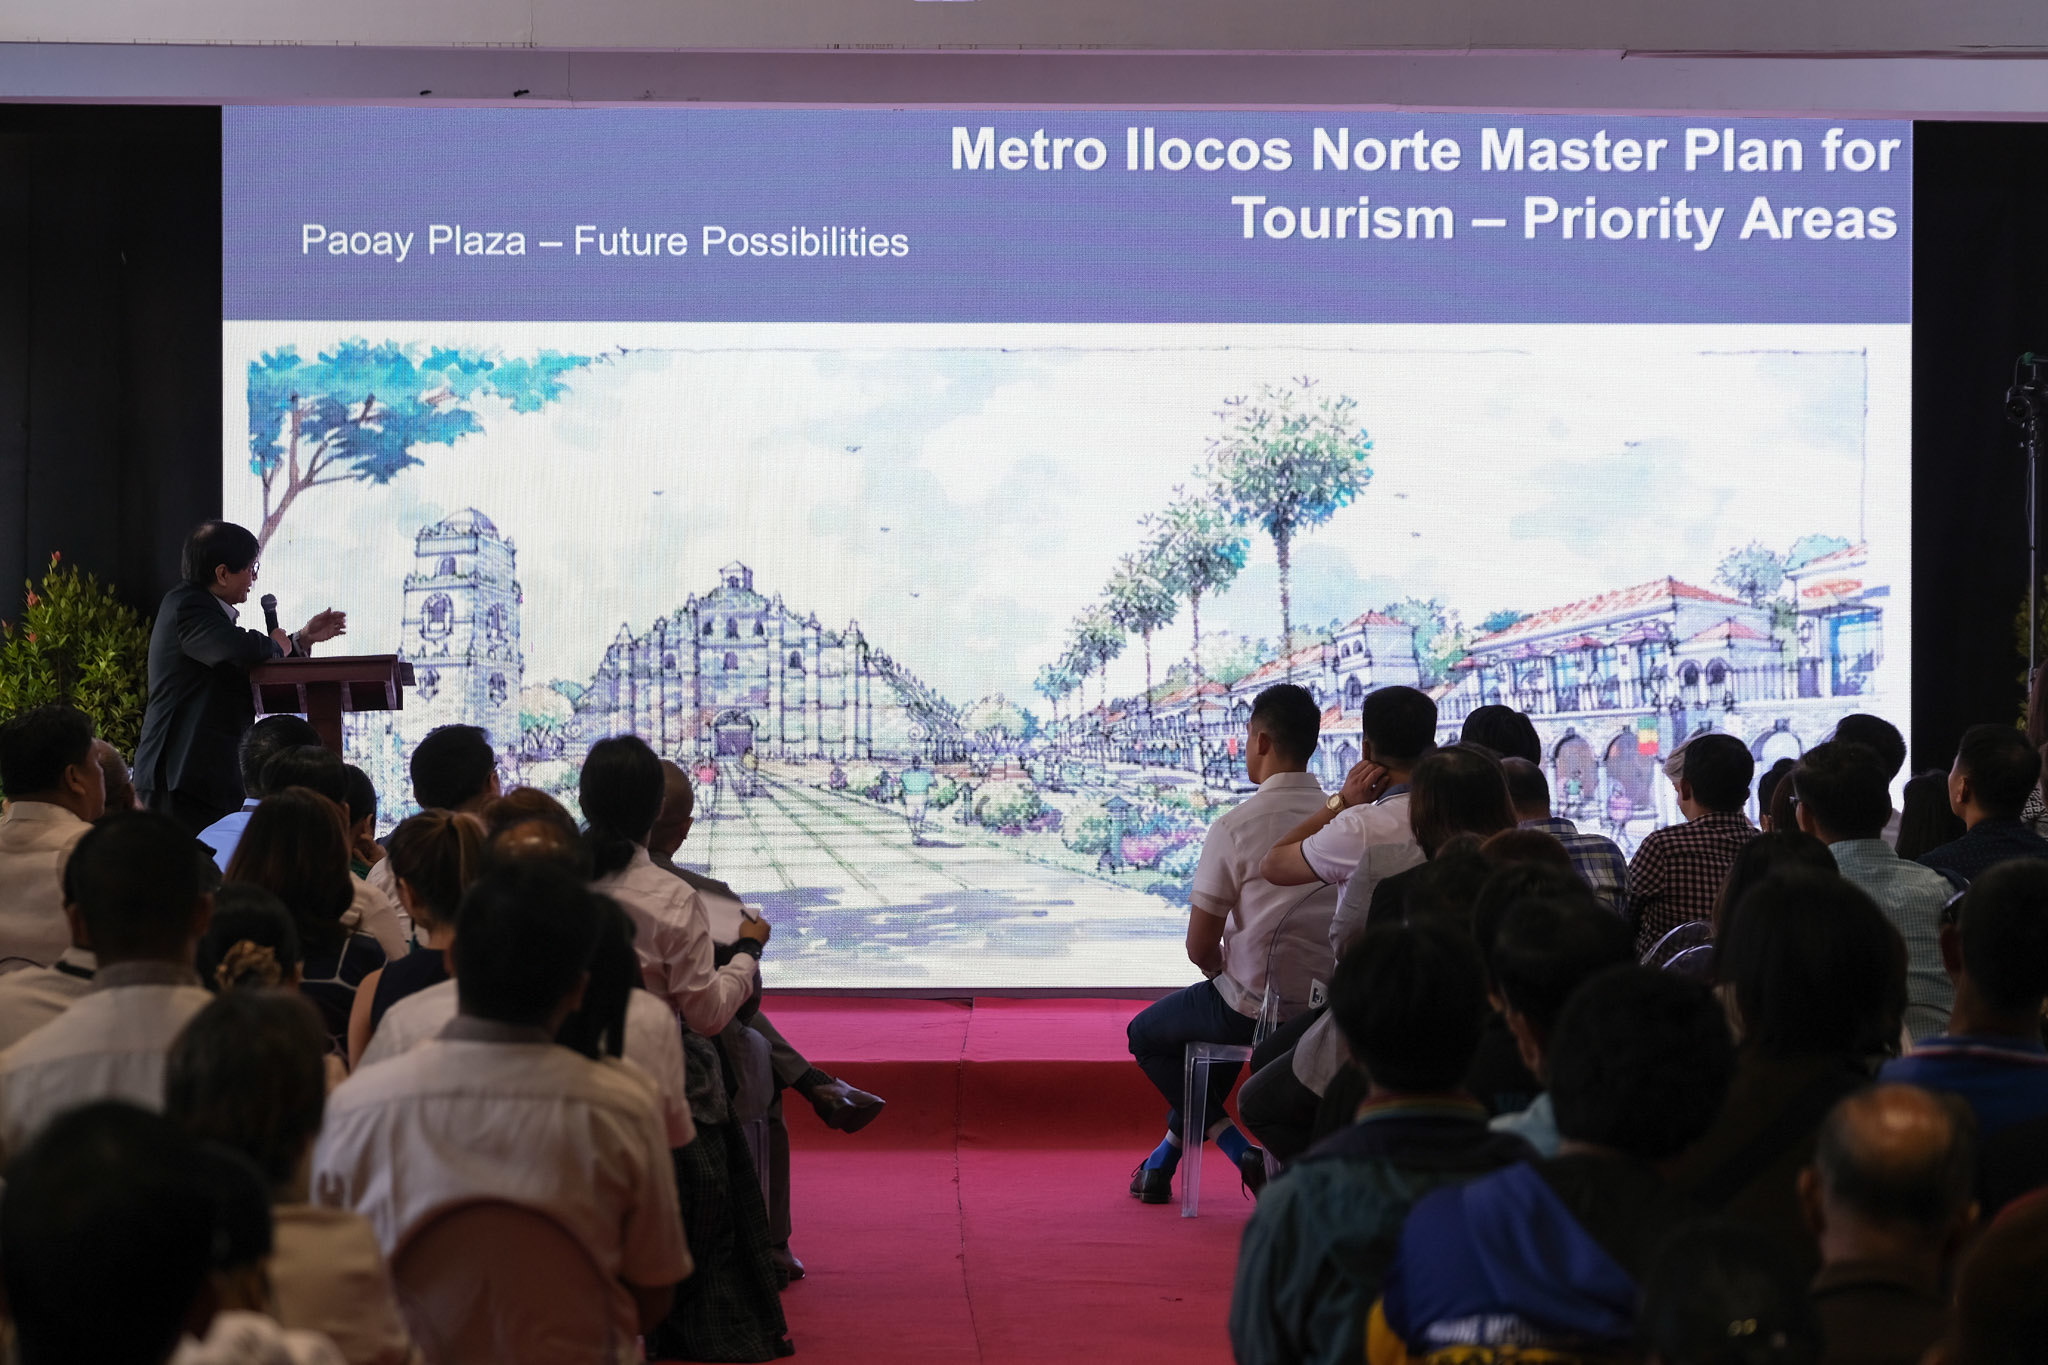 Global Ilocano masterplanner sees greater development in Ilocos Norte